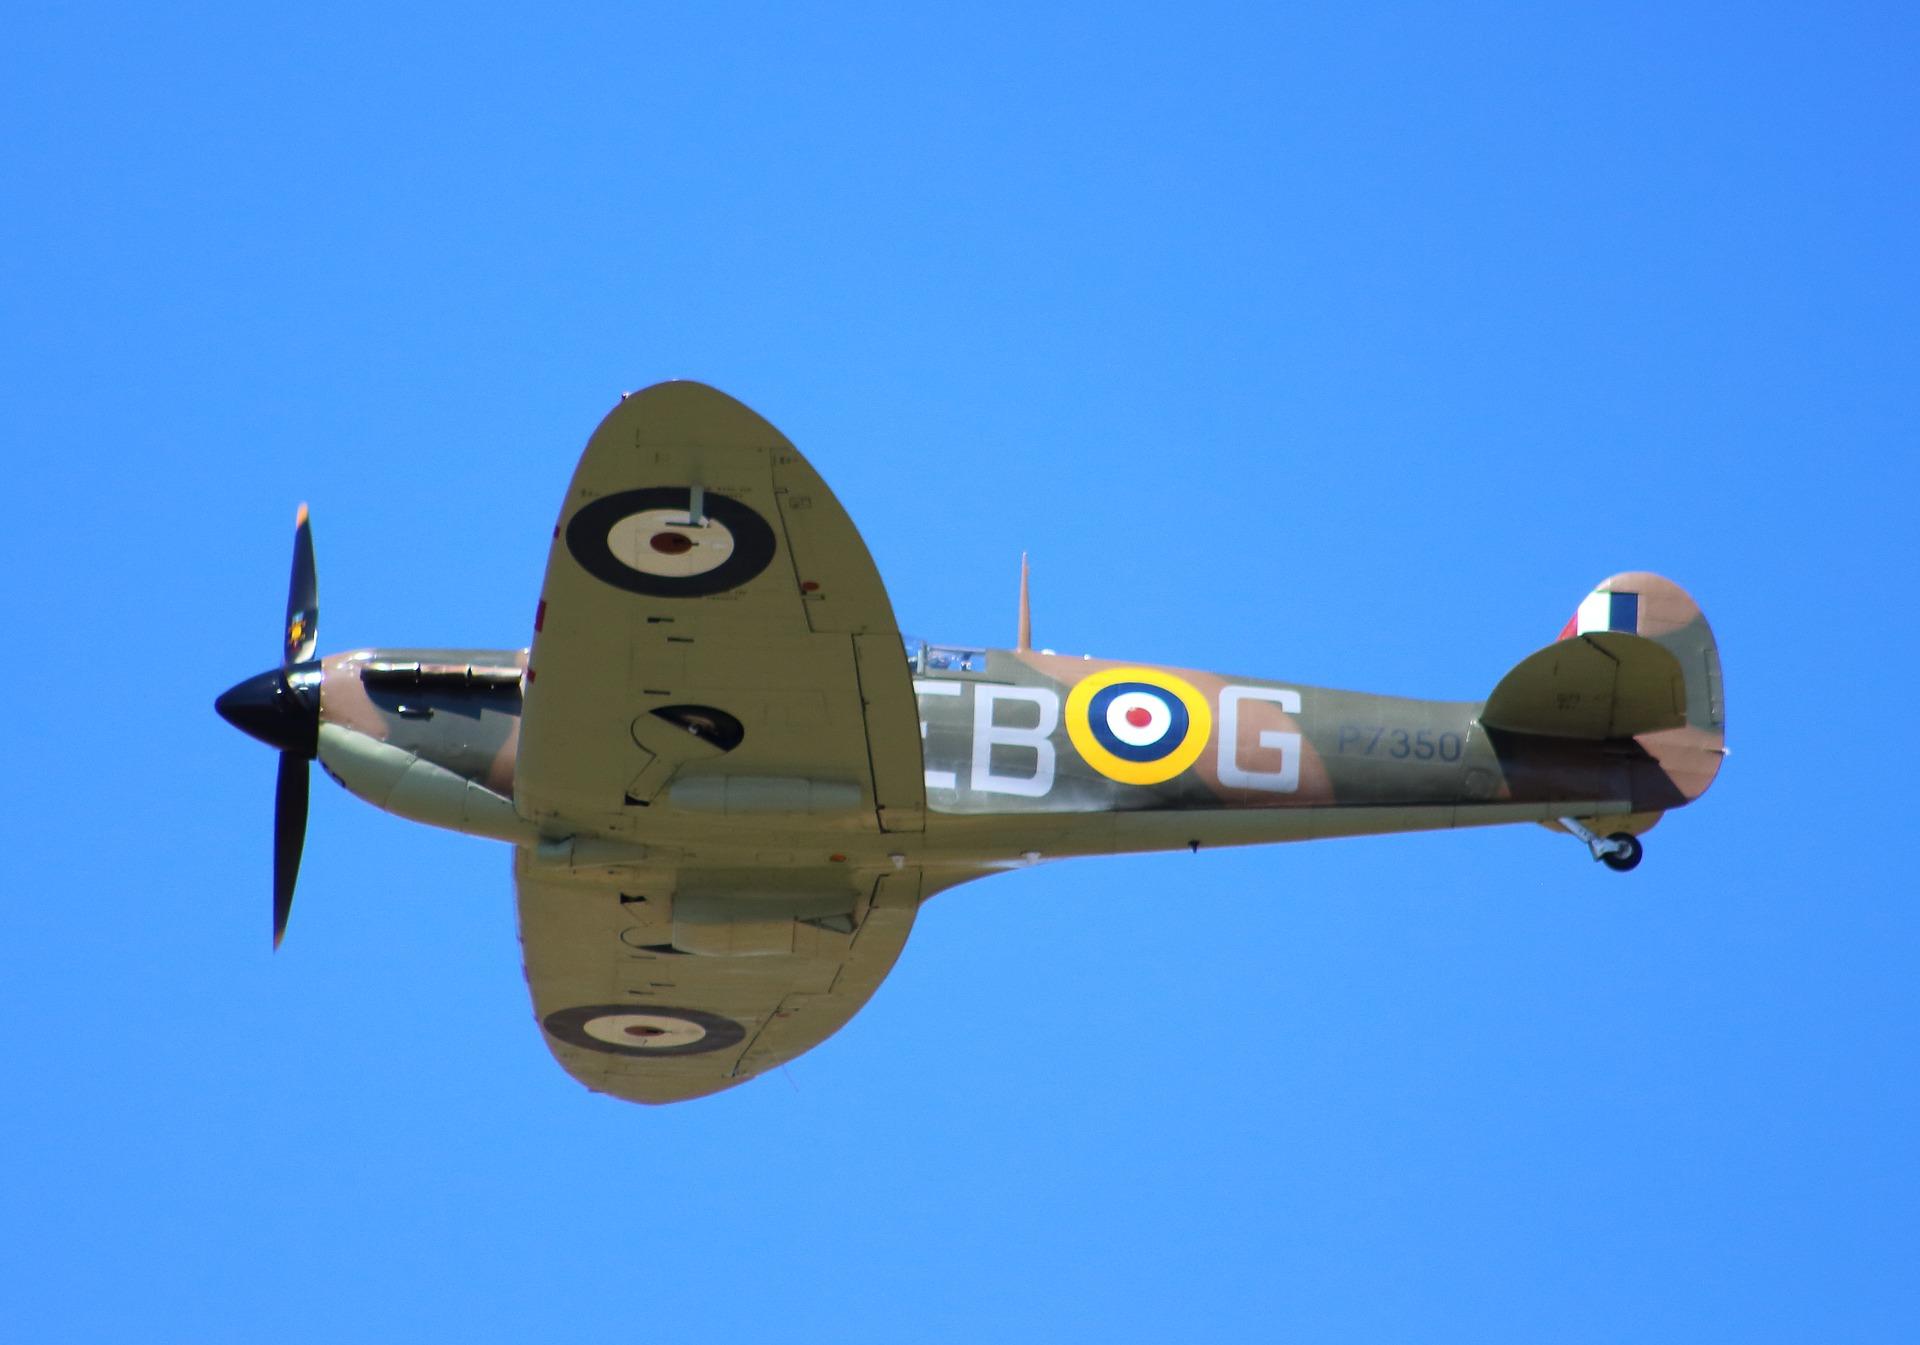 spitfire-1510828_1920